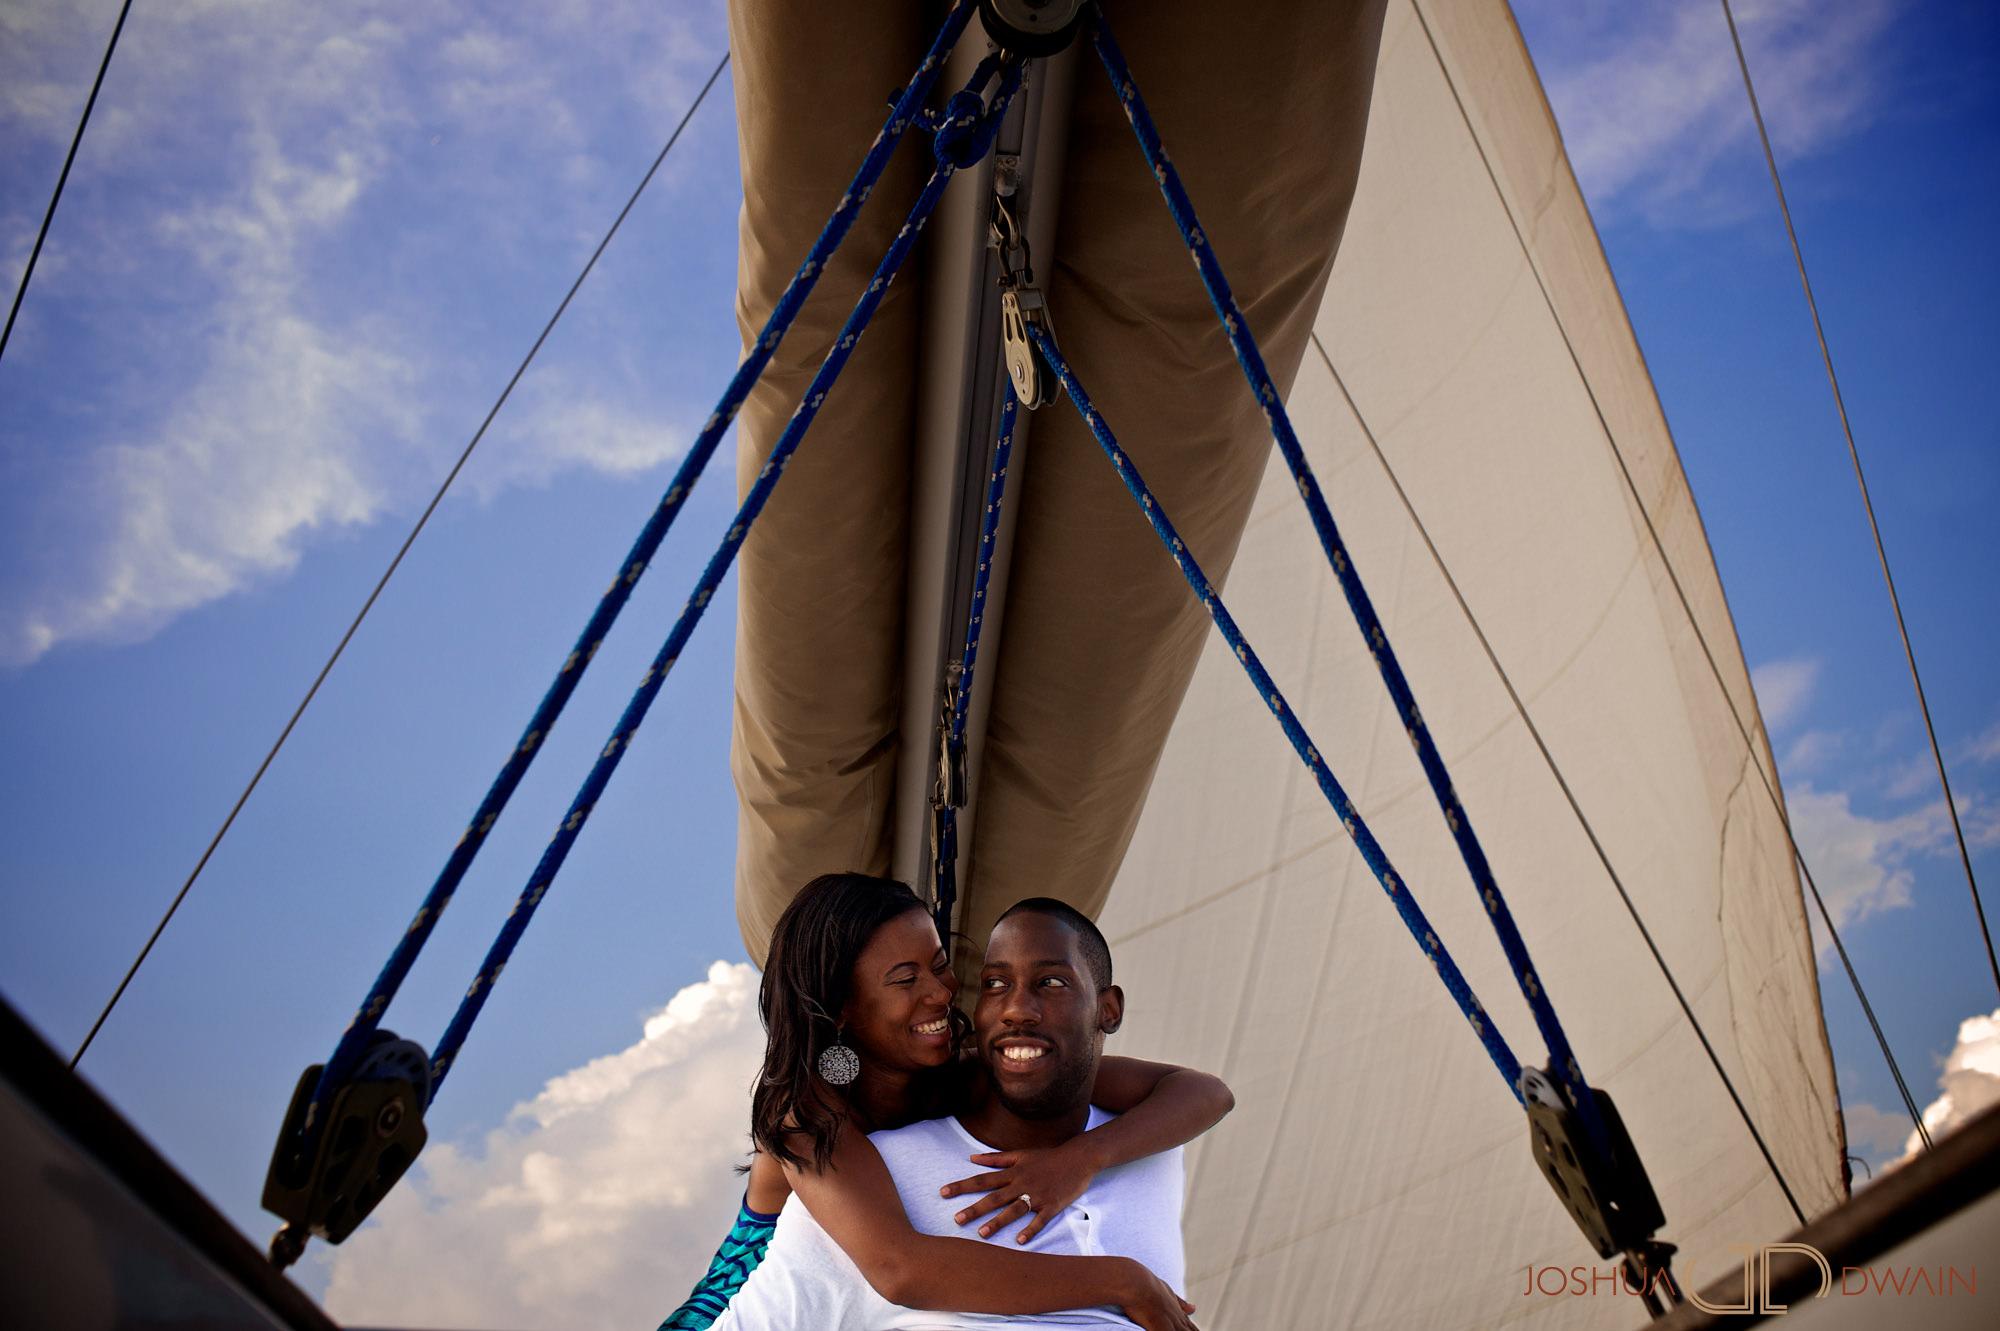 fiona-calvin-007-atlantic-yachting-new-york-ny-engagement-photographer-joshua-dwain-2013-07-09_FC_034